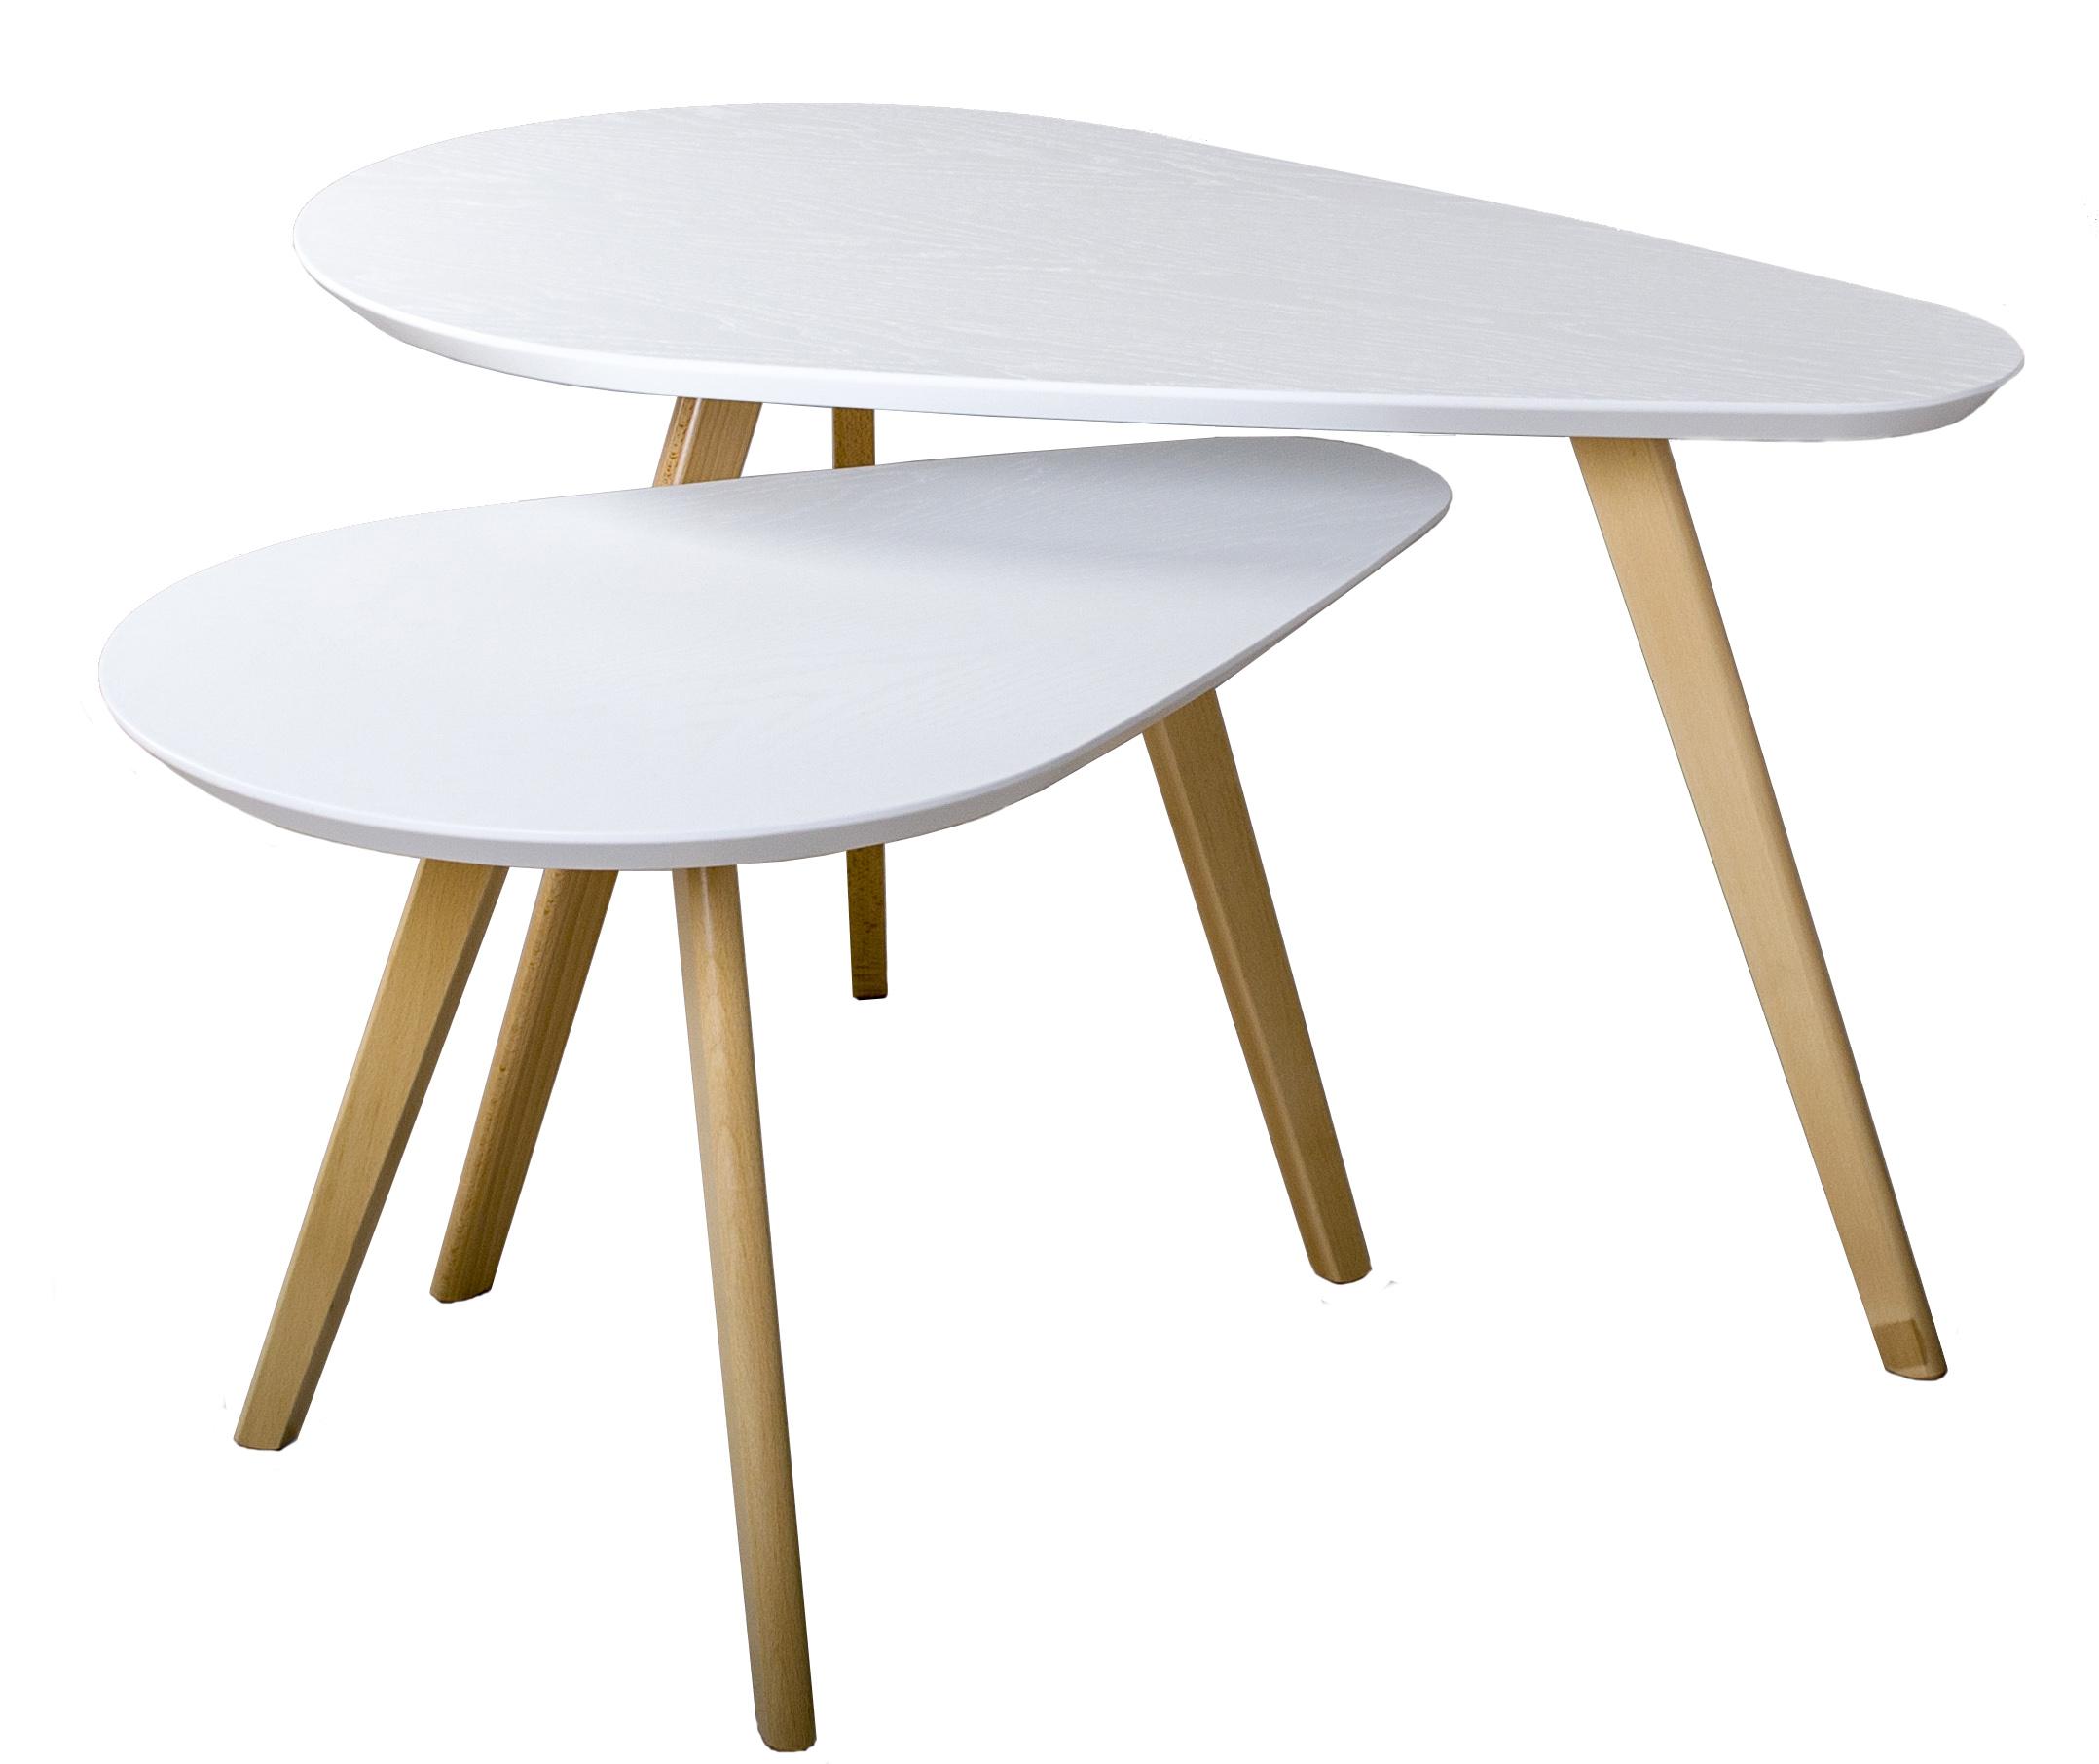 Harmony Coffee Table (double) from GVA Interiors